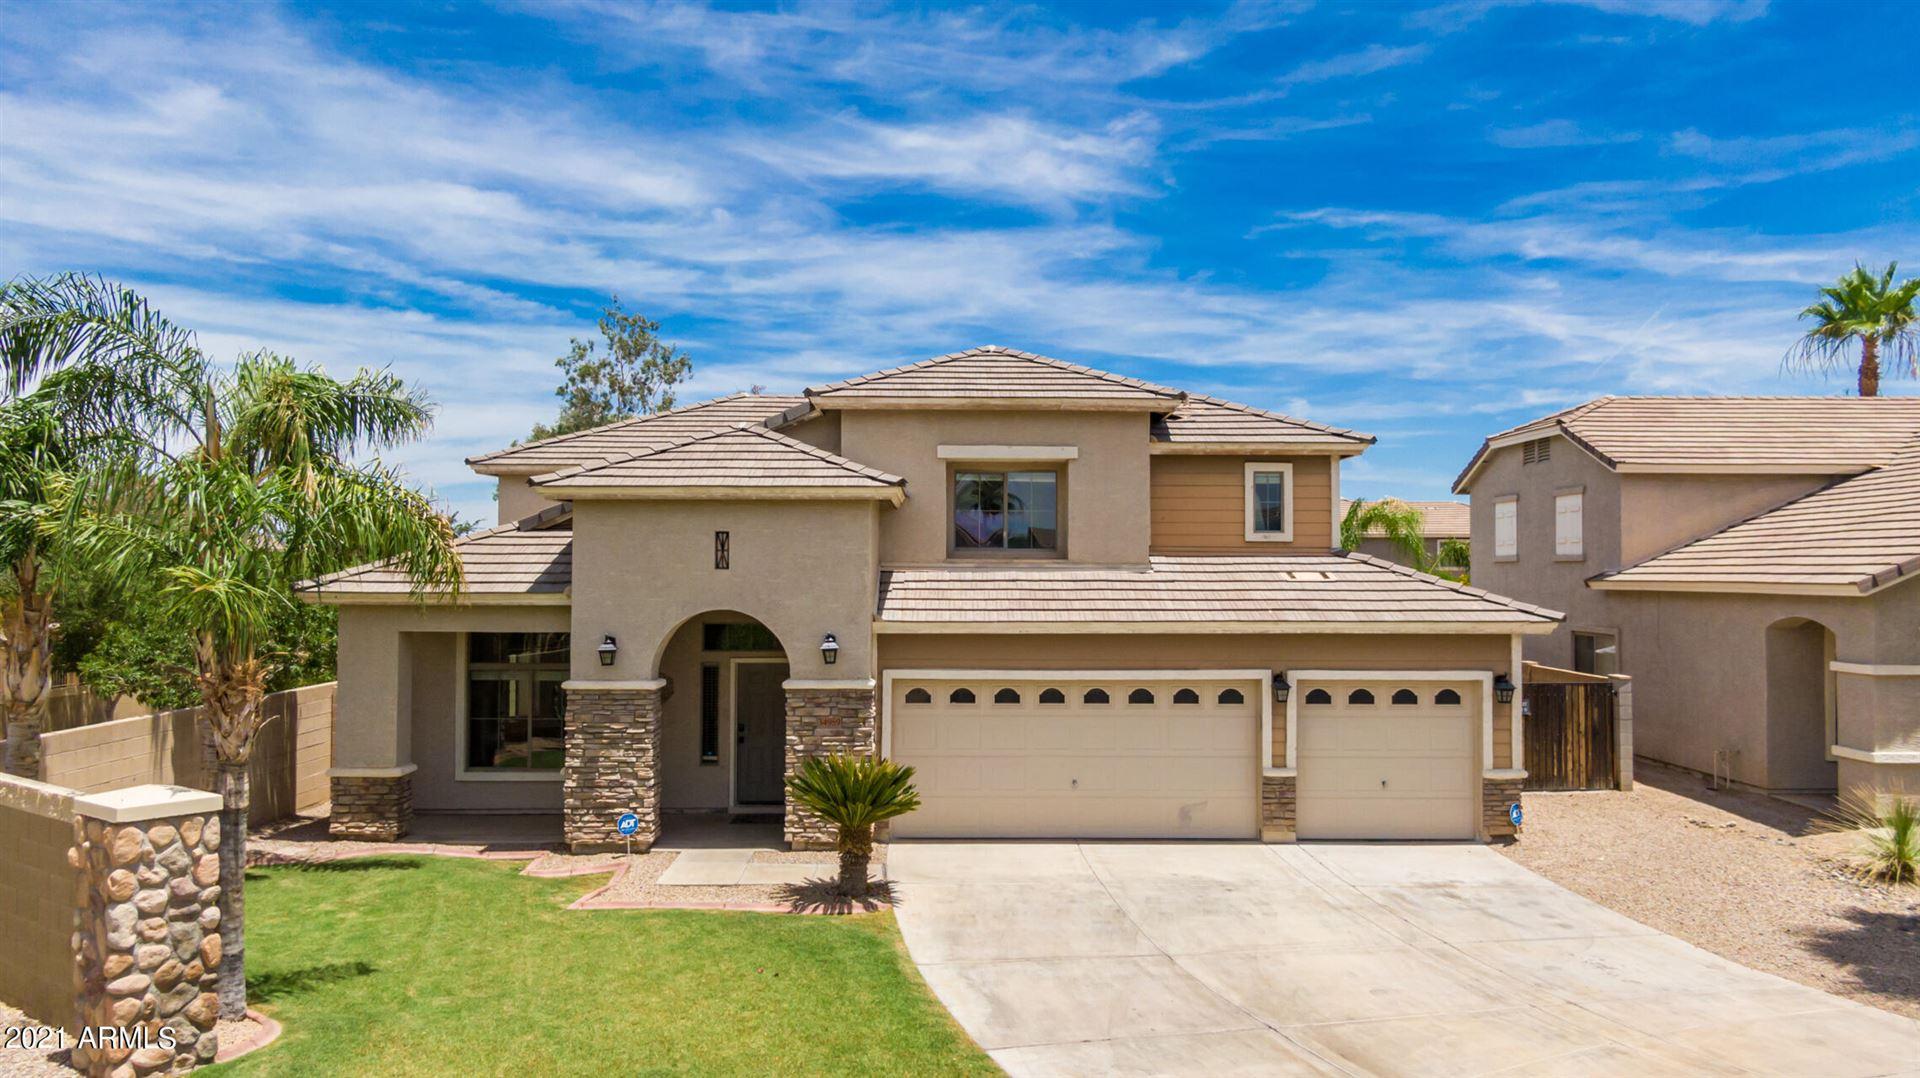 Photo of 34989 N STIRRUP Circle, Queen Creek, AZ 85142 (MLS # 6248970)